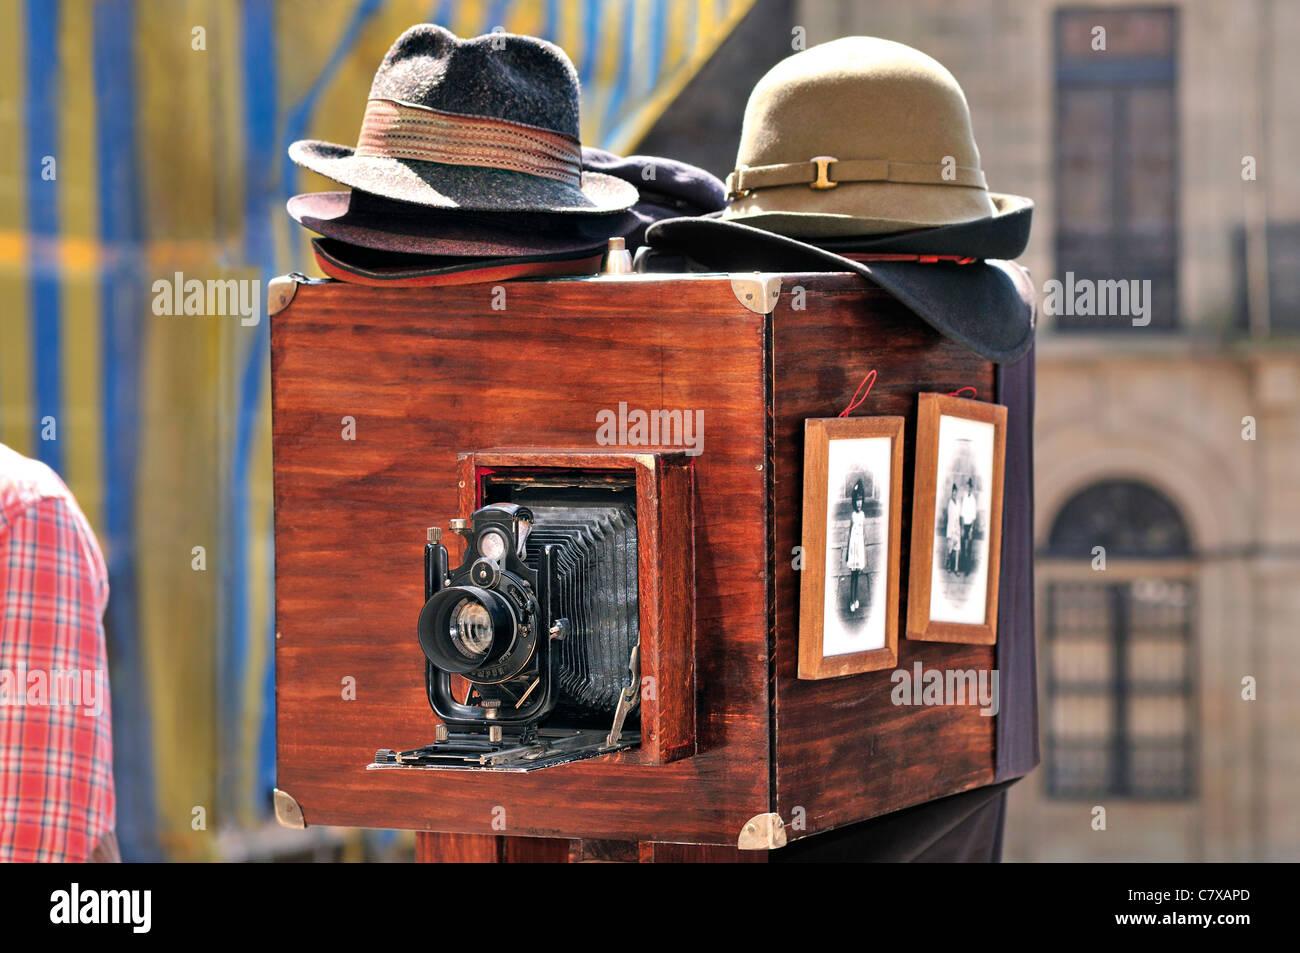 Spain, Santiago de Compostela: Nostalgic analog camera in front of the cathedral of Santiago de Compostela - Stock Image